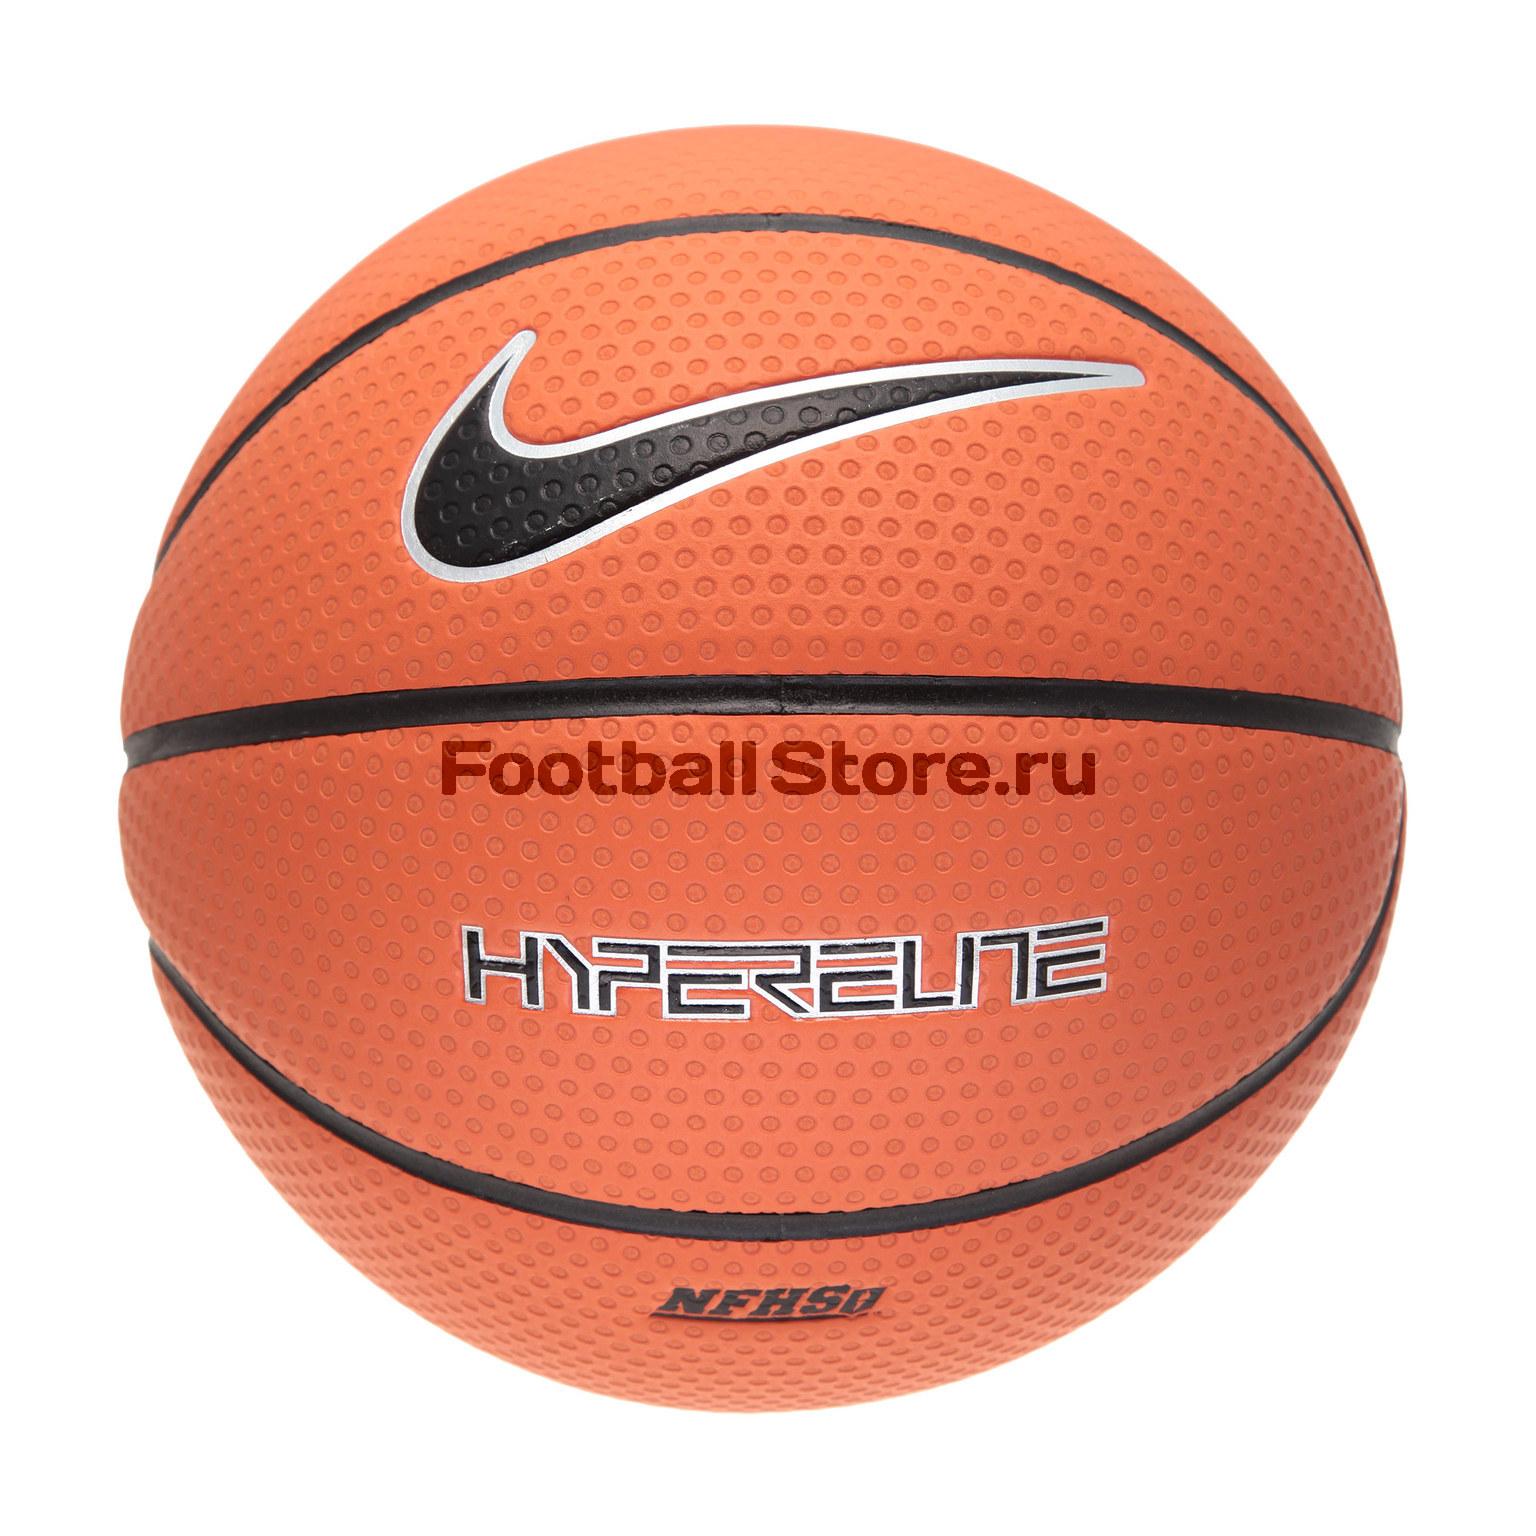 Мяч баскетбольный Nike Hyper Elite 8P 06 N.KL.02.855 чулок д щитков nike guard lock elite sleeve su12 se0173 011 l чёрный